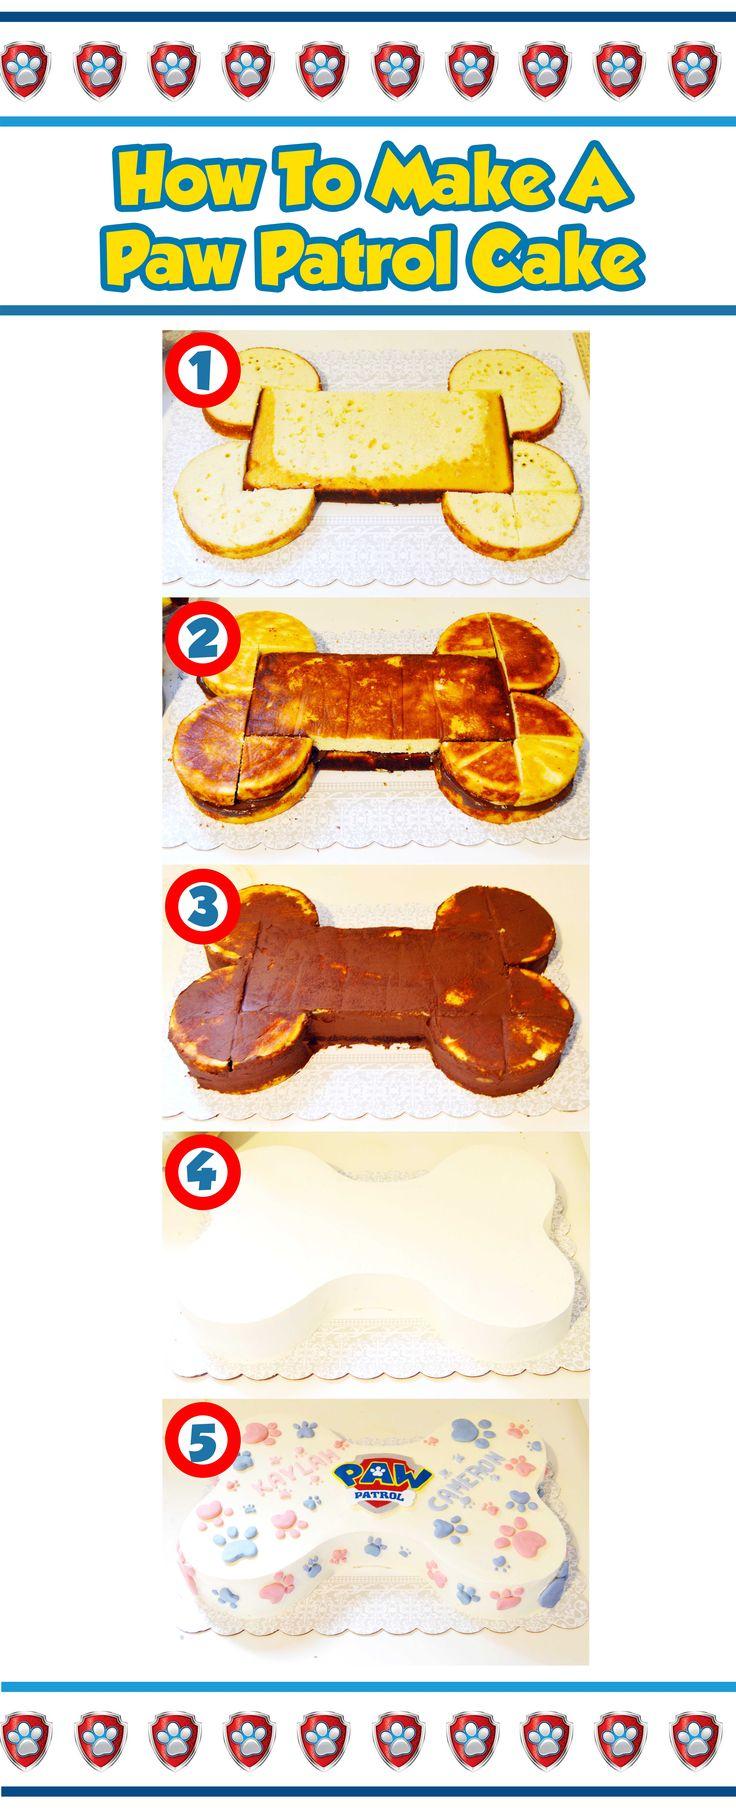 how to make a paw patrol cake